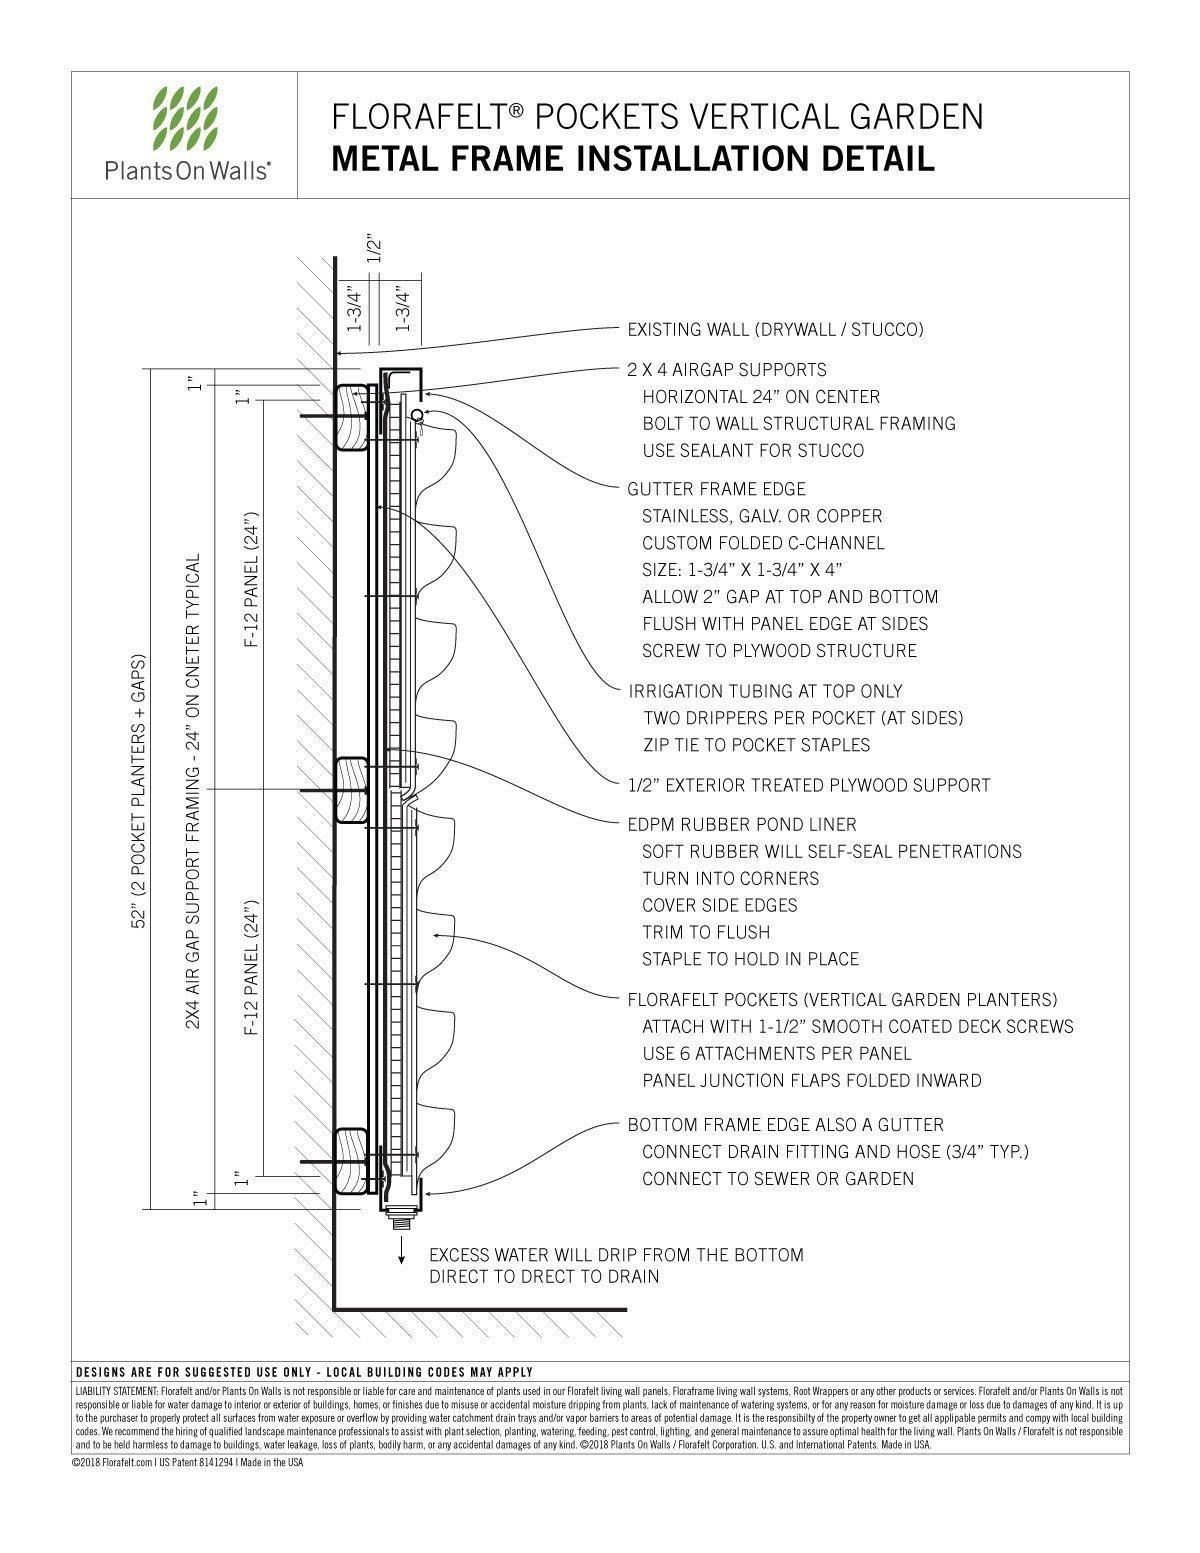 Florafelt-Pockets-Mounting-Metal-Frame-Installation-Detail | Plants ...